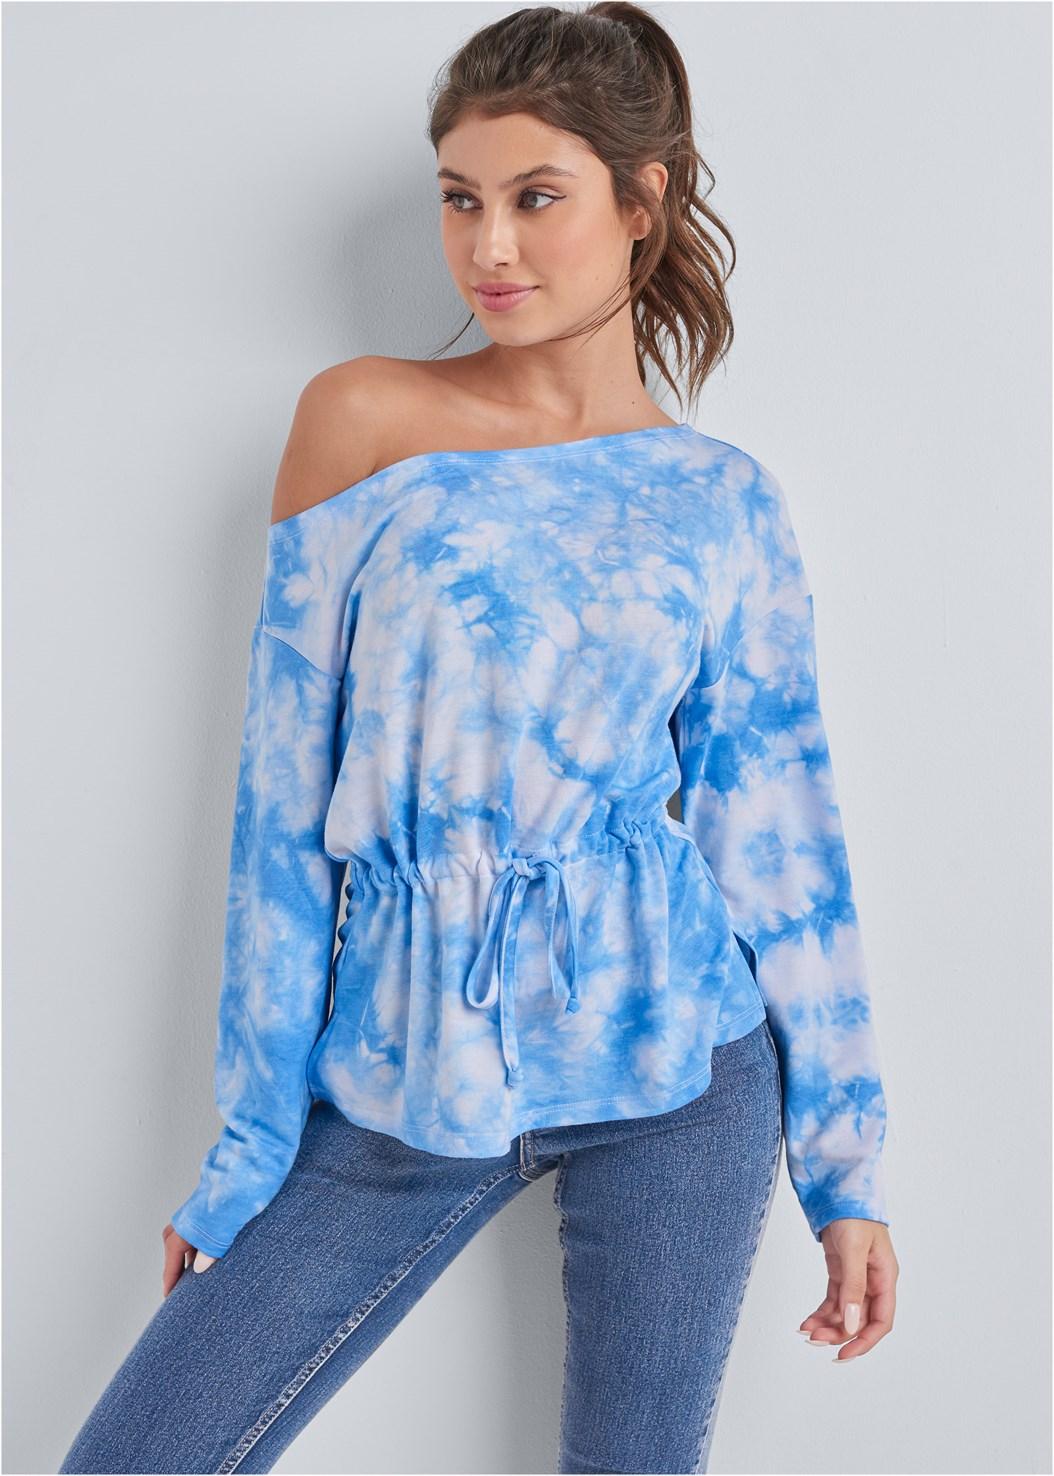 Mineral Wash Off Shoulder Sweatshirt,Mid Rise Color Skinny Jeans,Capri Legging Two Pack